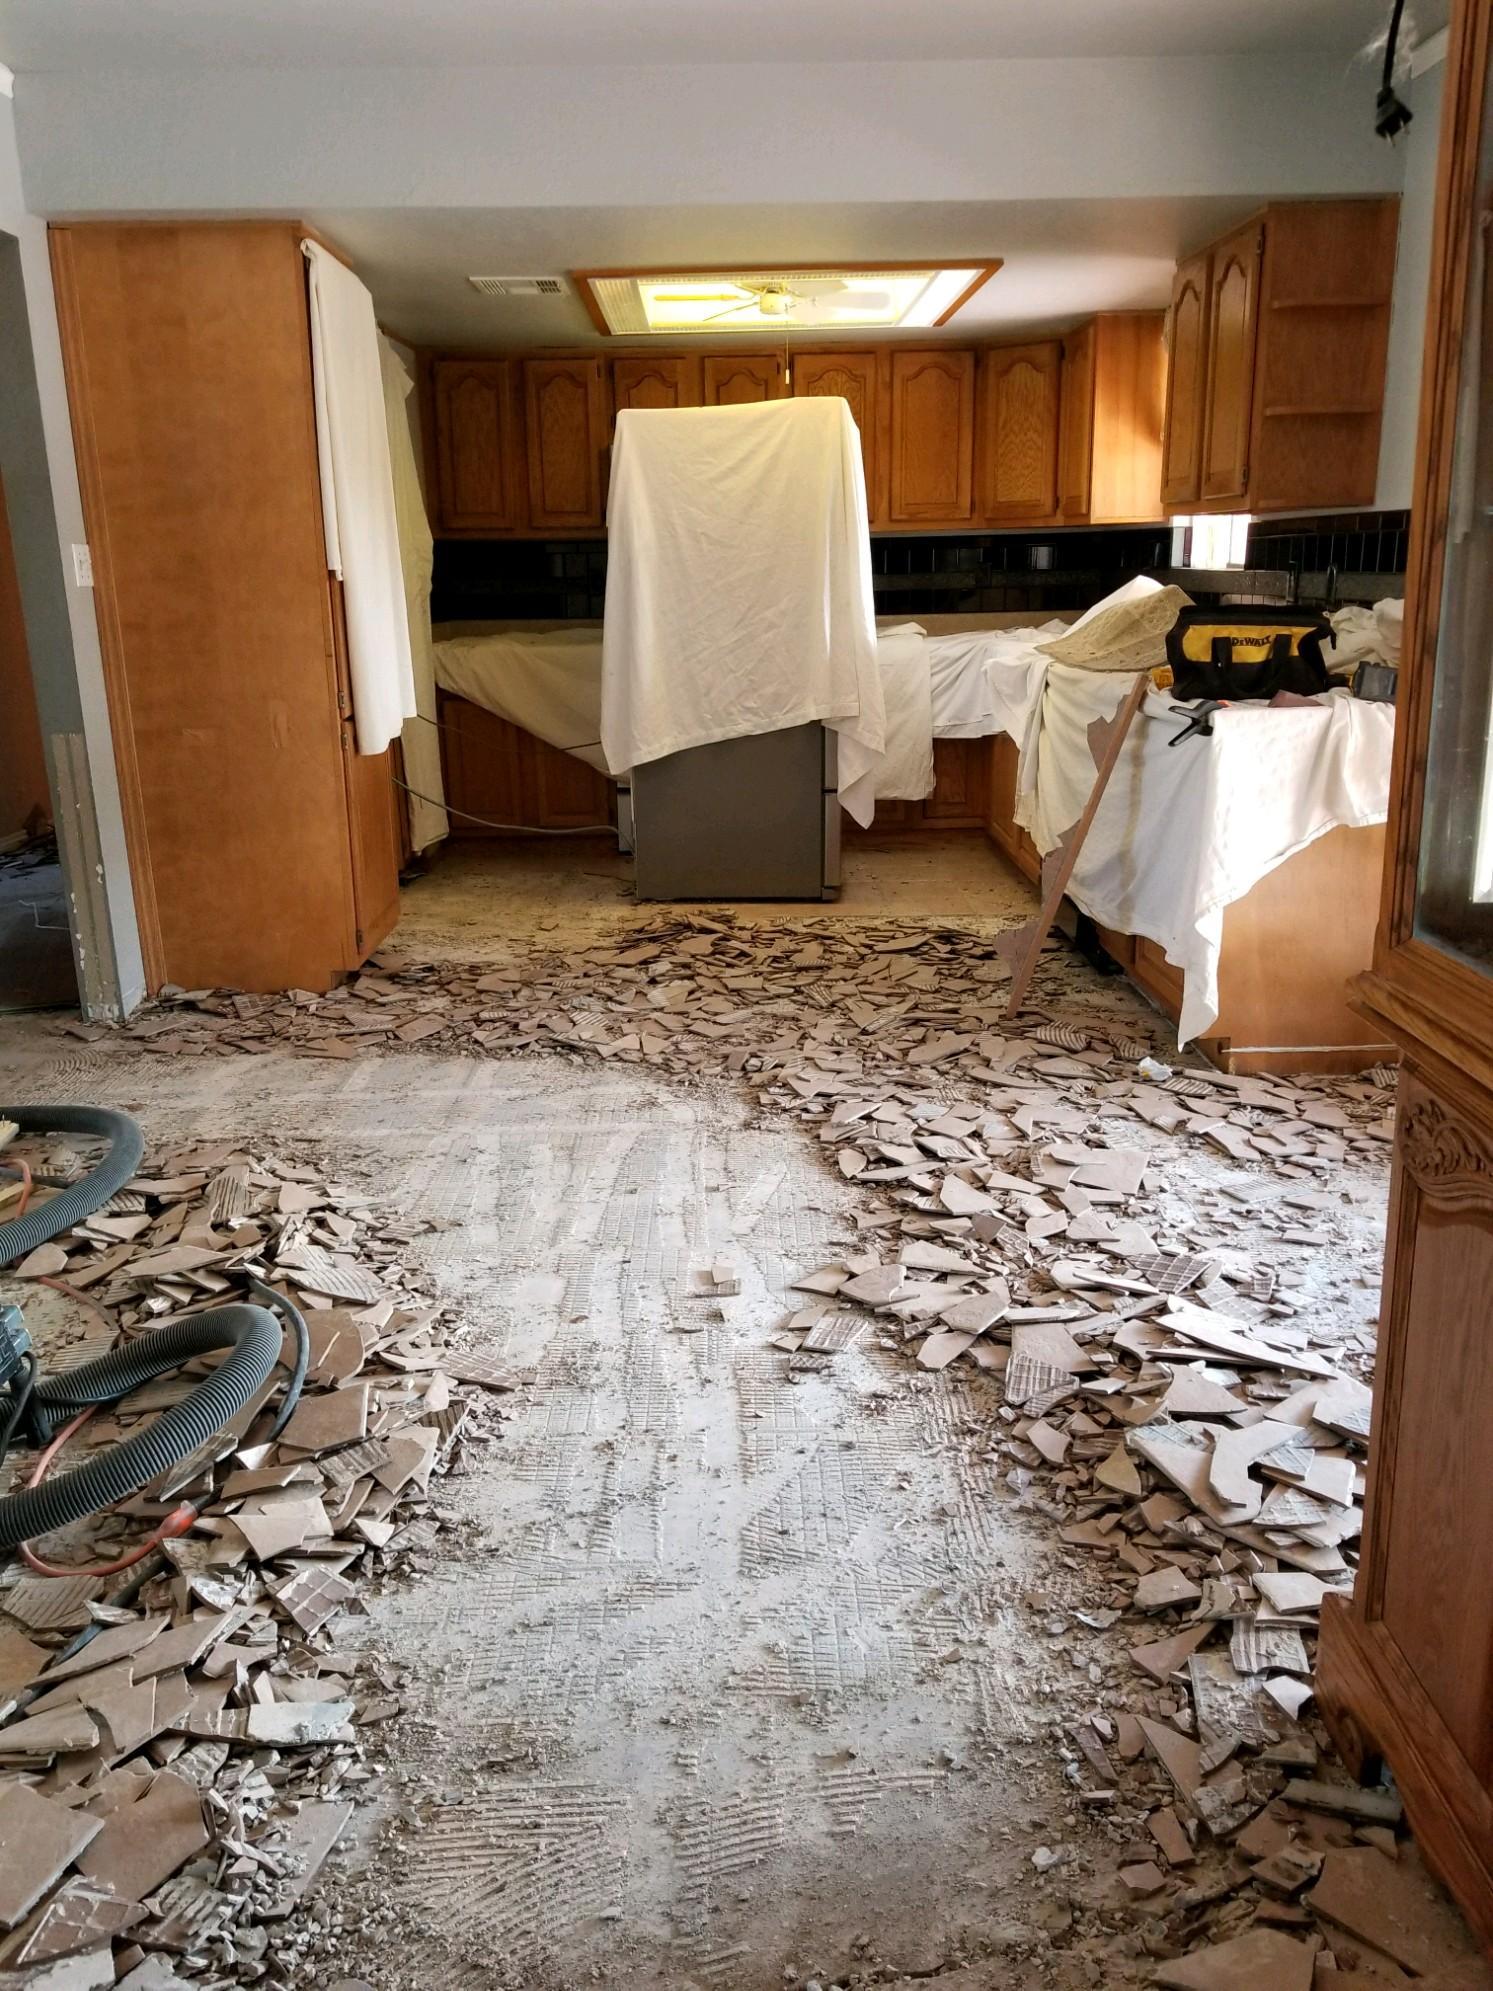 Dustless Tile Removal Phoenix AZ - Dust Sucker Demolition : Dust Free Tile Removal